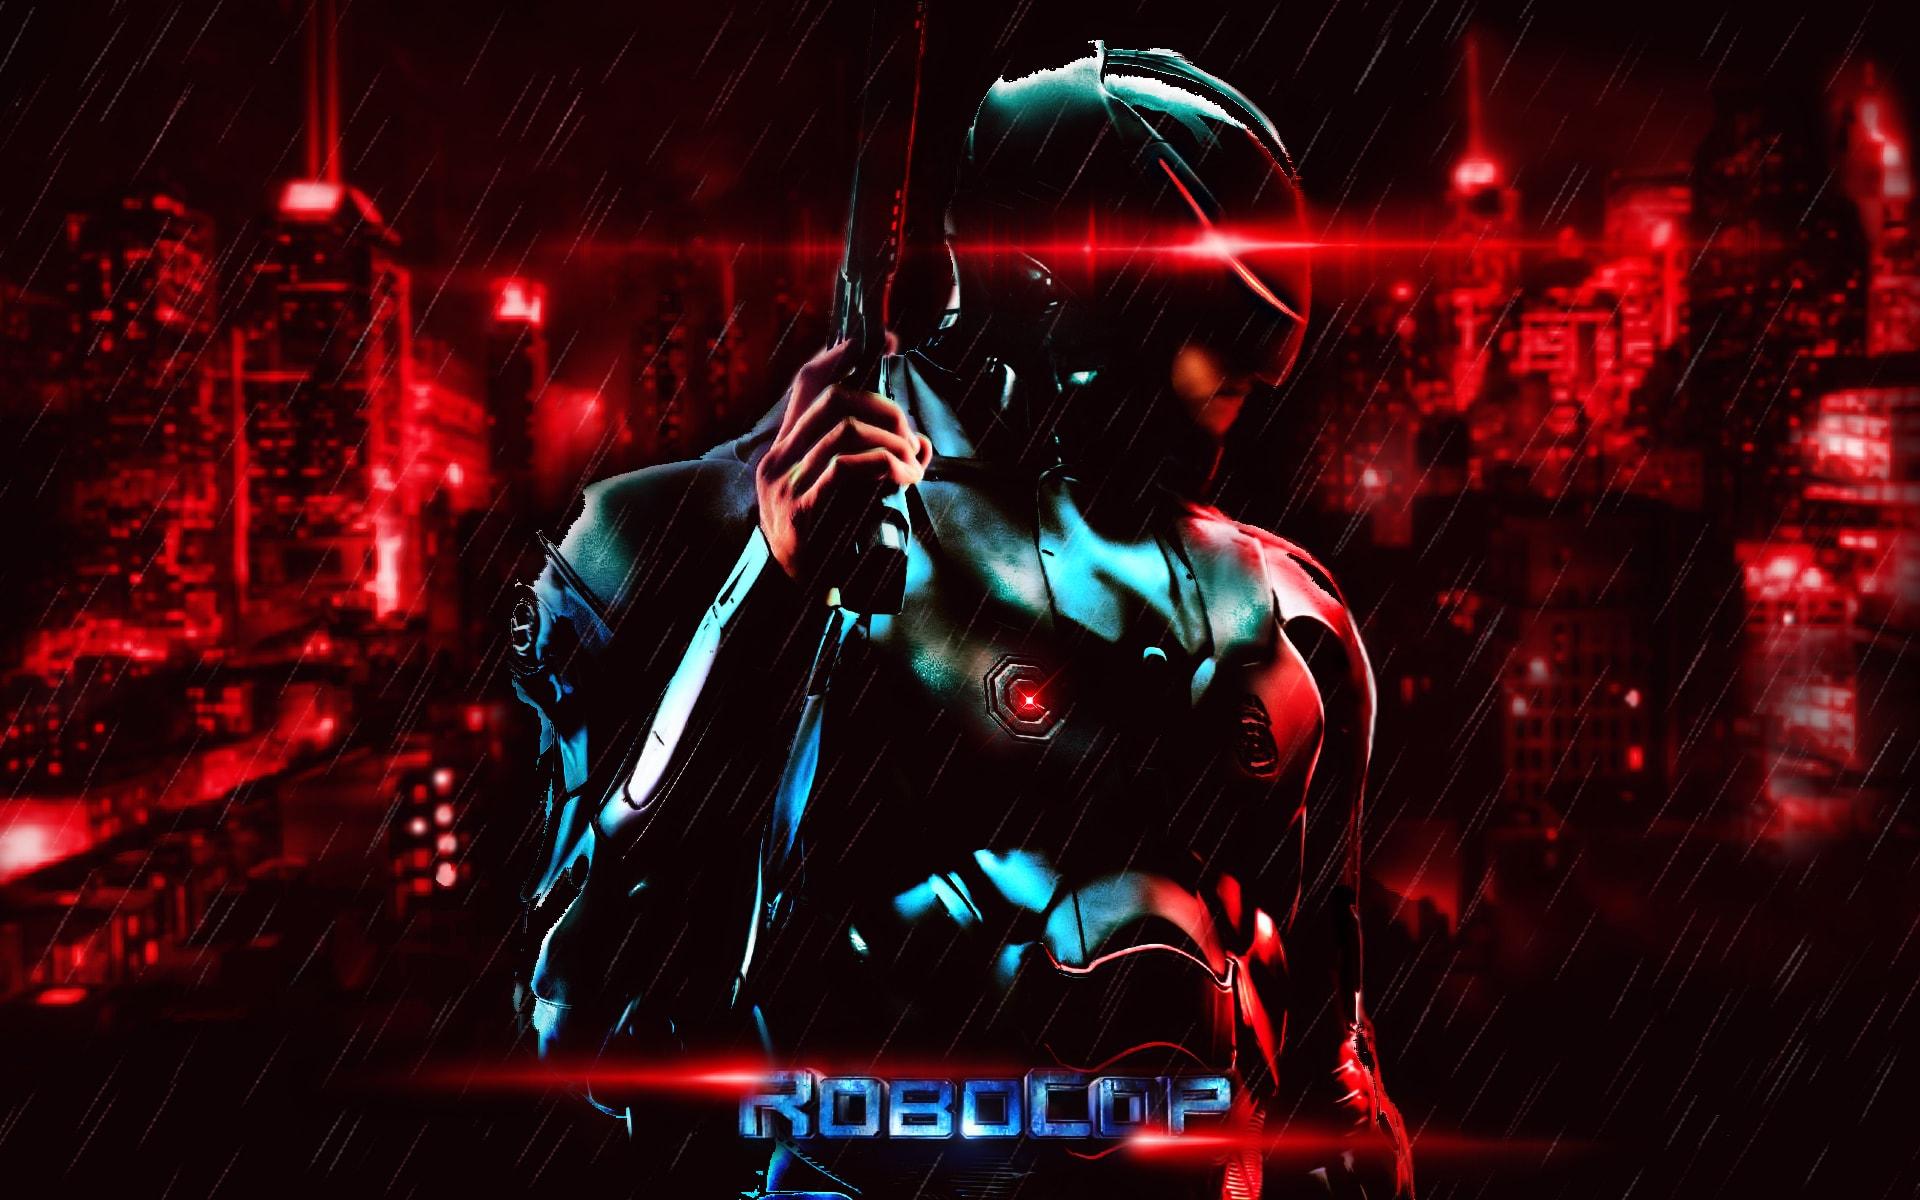 RoboCop 2014 HD